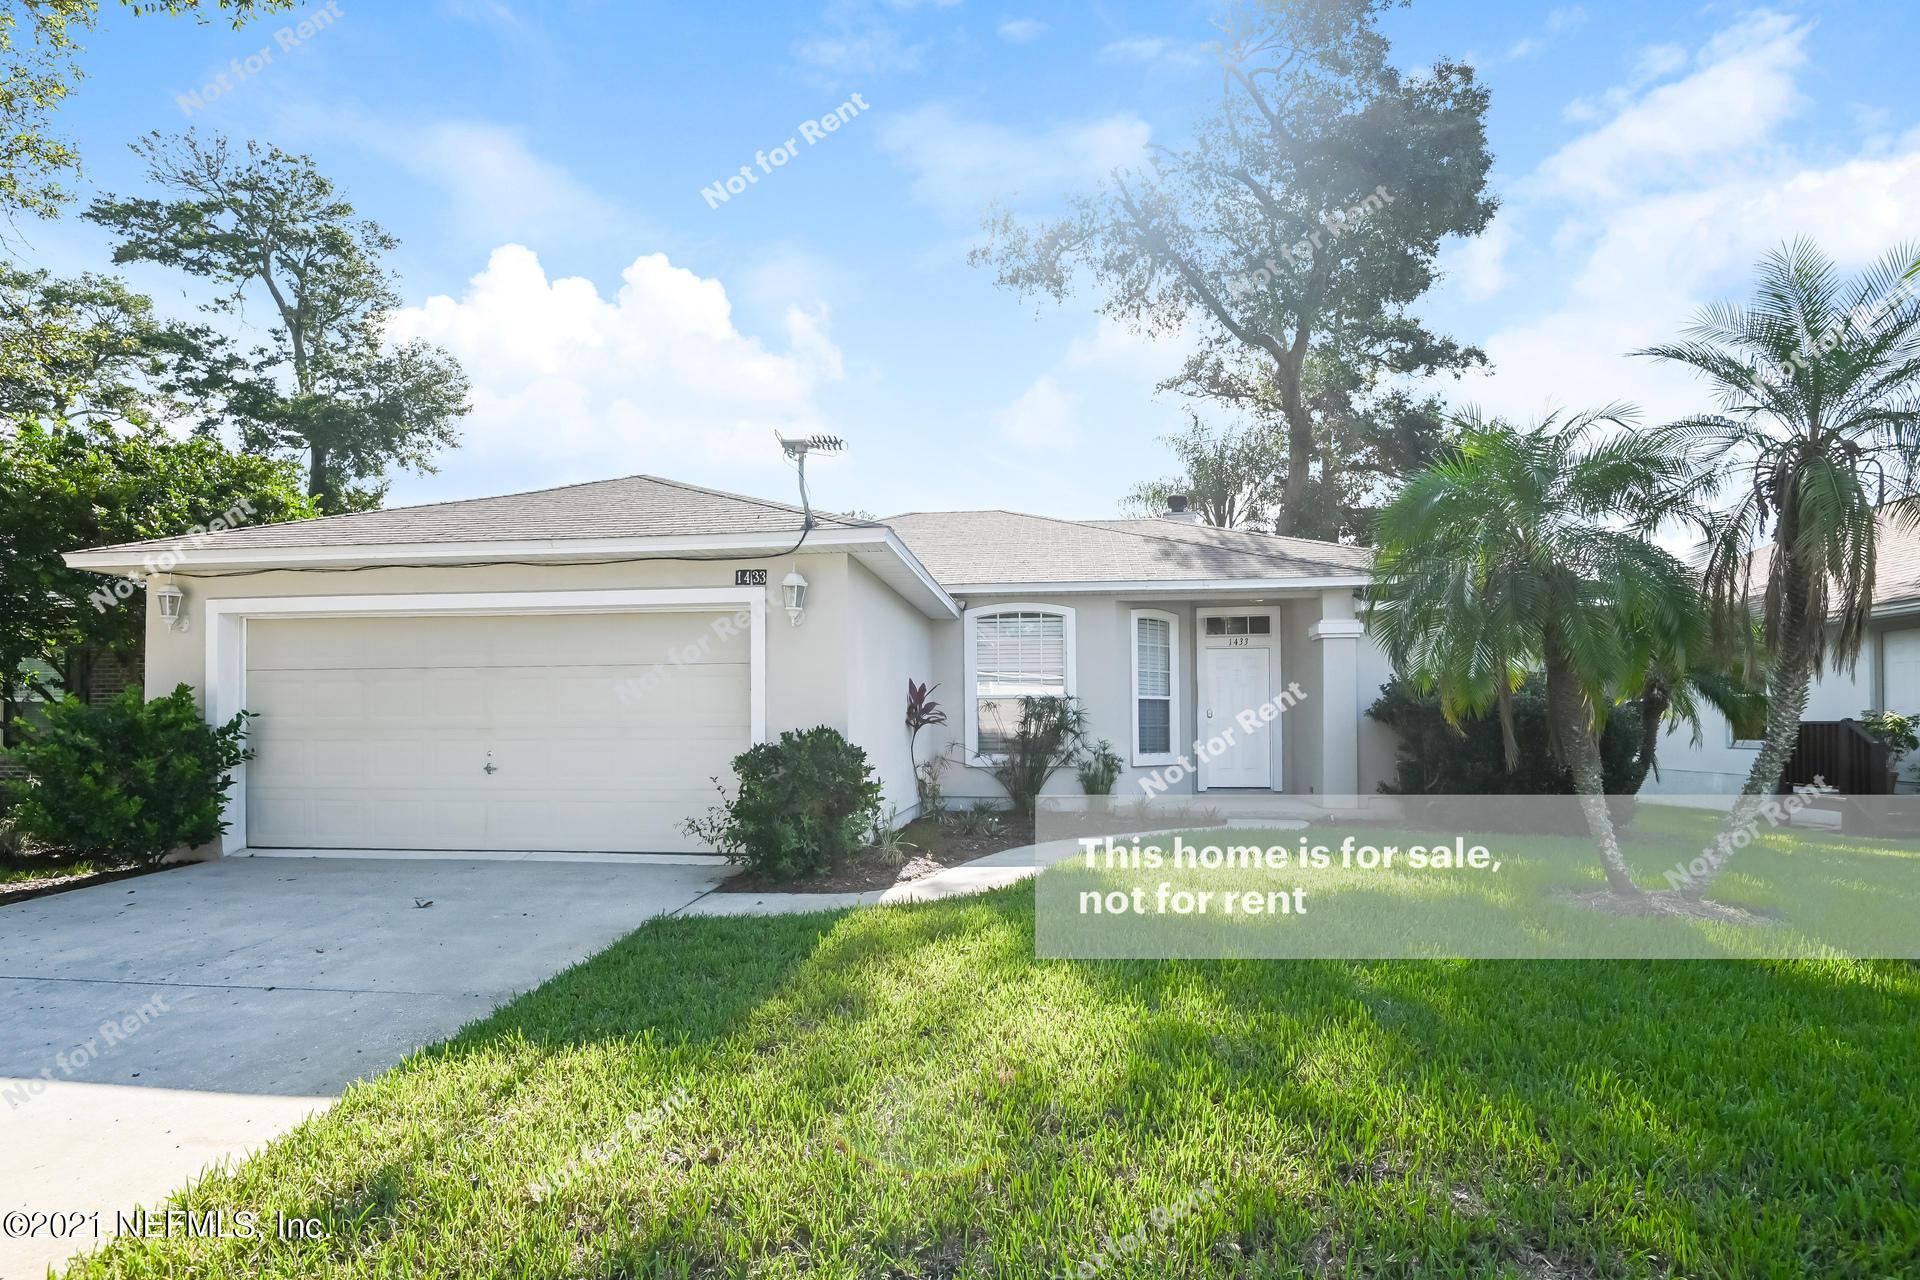 1433 SOARING FLIGHT, JACKSONVILLE, FLORIDA 32225, 3 Bedrooms Bedrooms, ,2 BathroomsBathrooms,Residential,For sale,SOARING FLIGHT,1123814